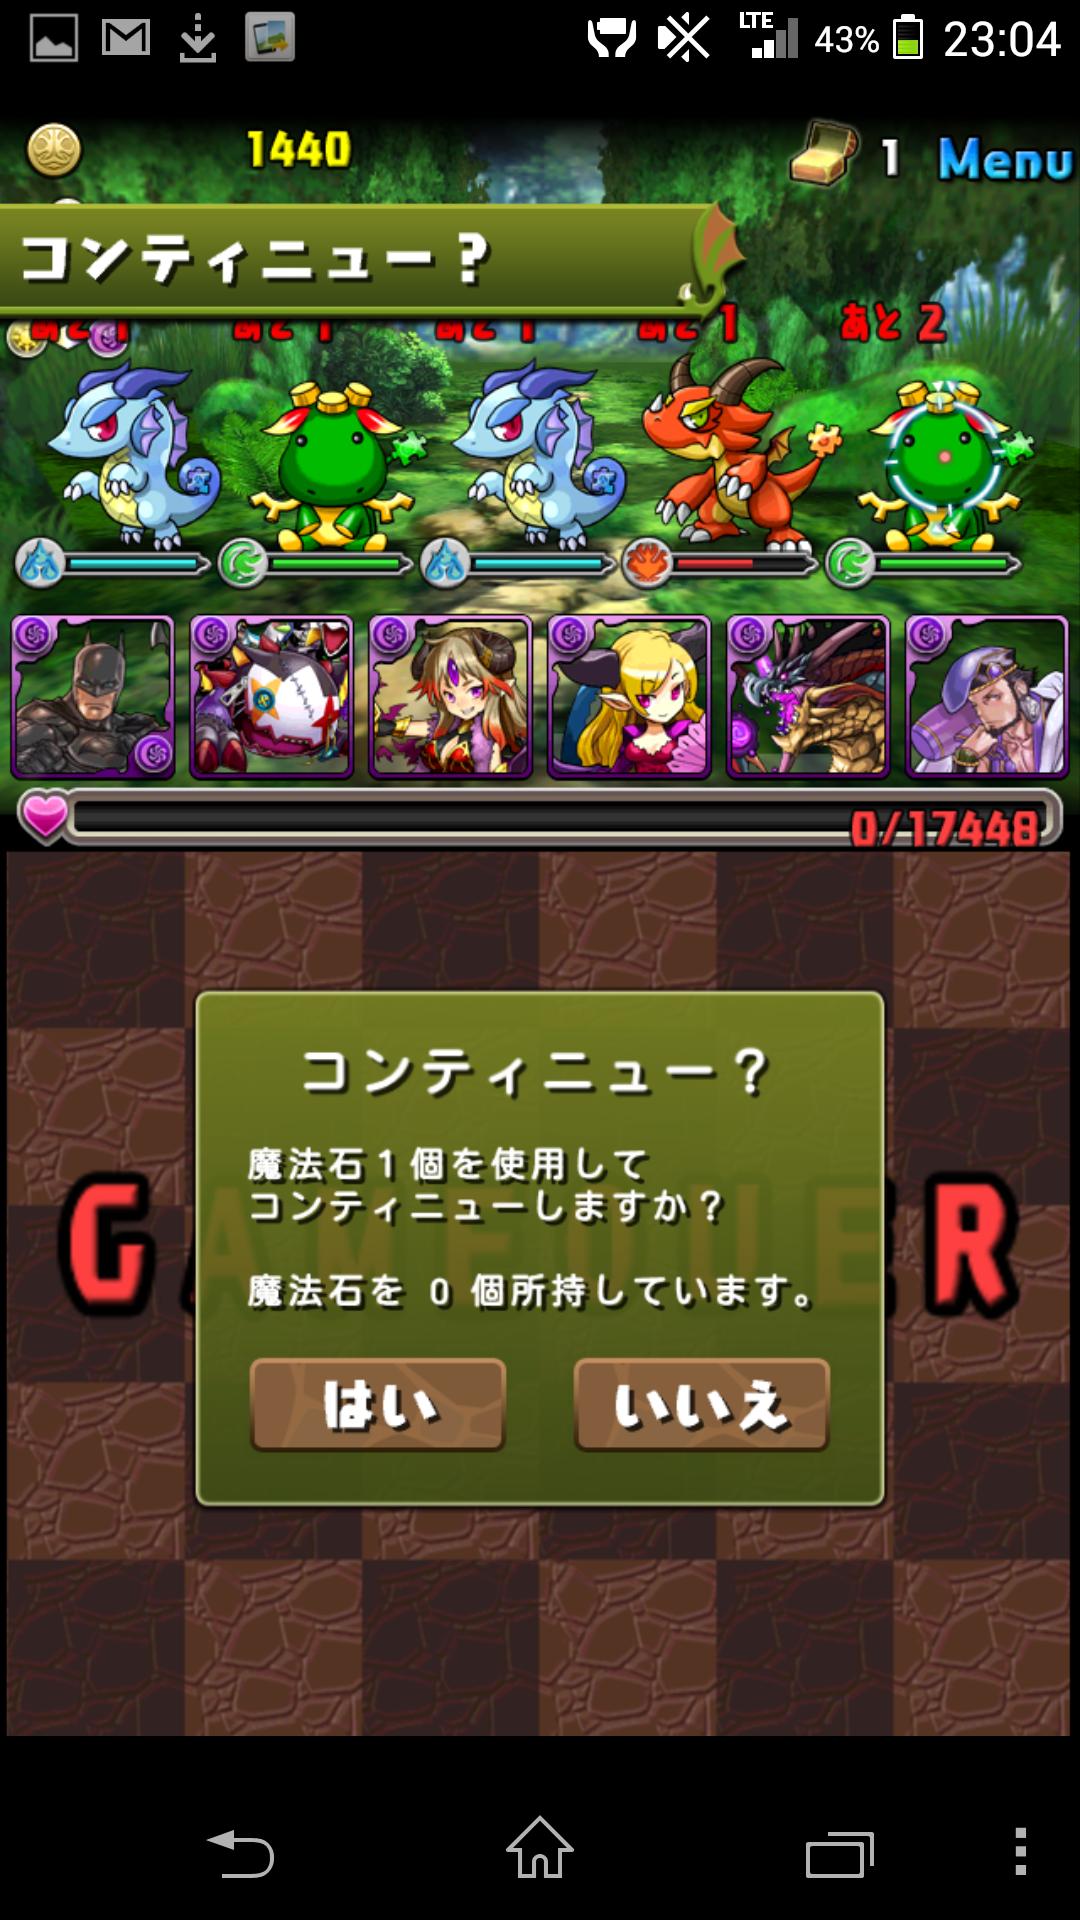 Screenshot_2014-04-15-23-04-34.png